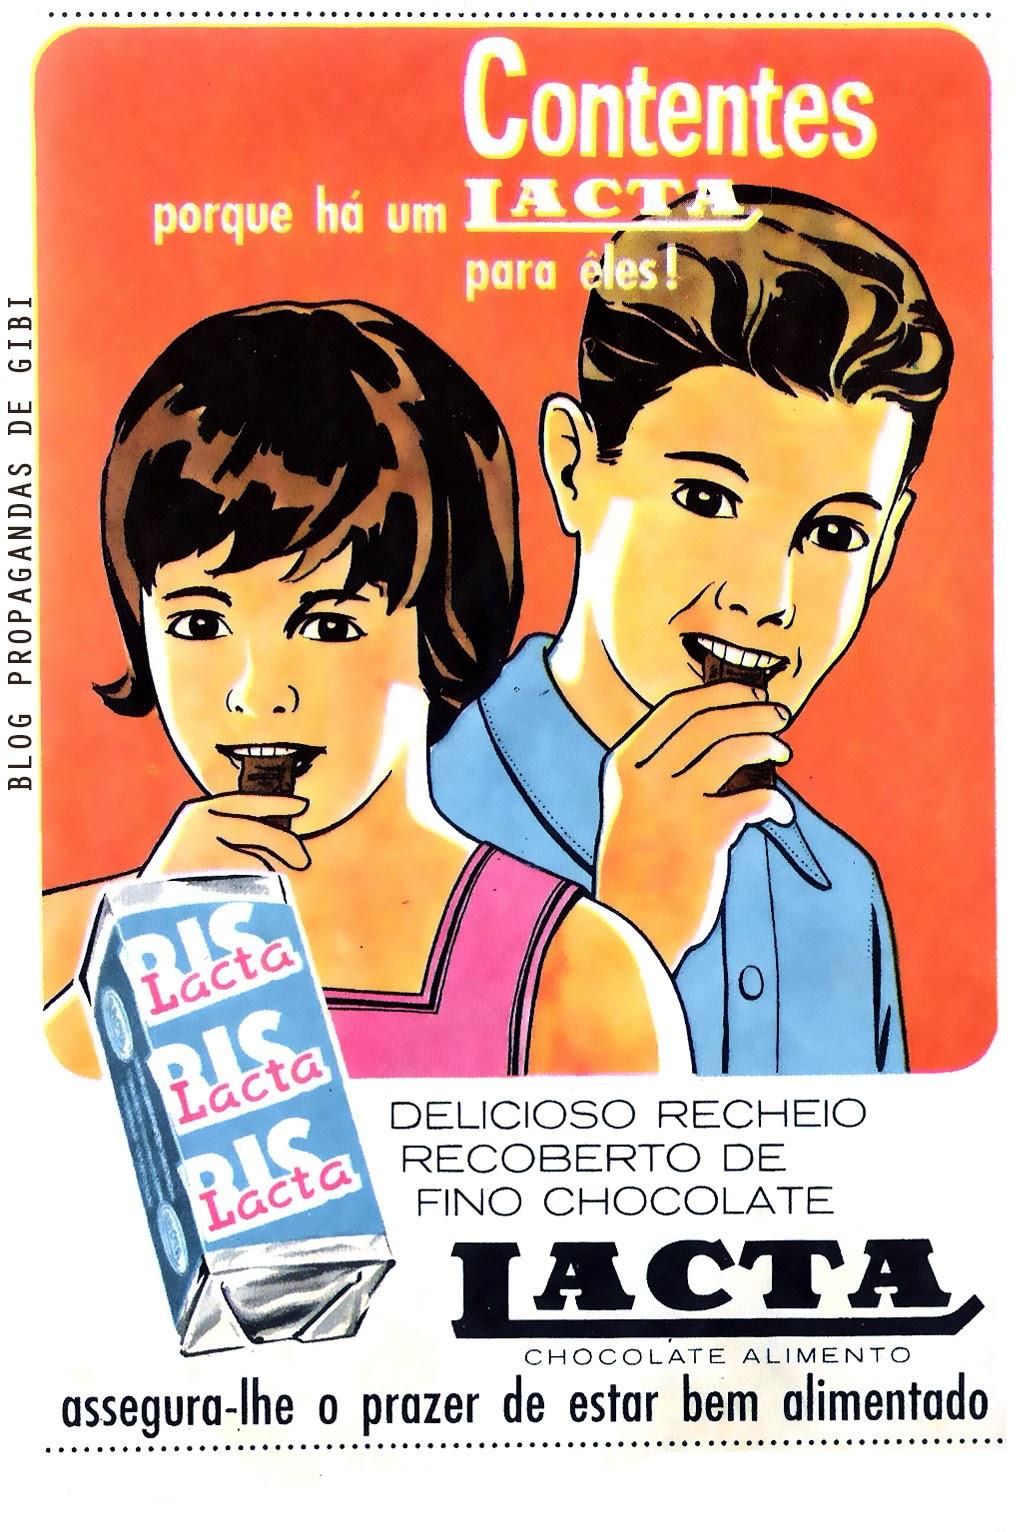 Propaganda do chocolate Bis (Lacta) em 1963.